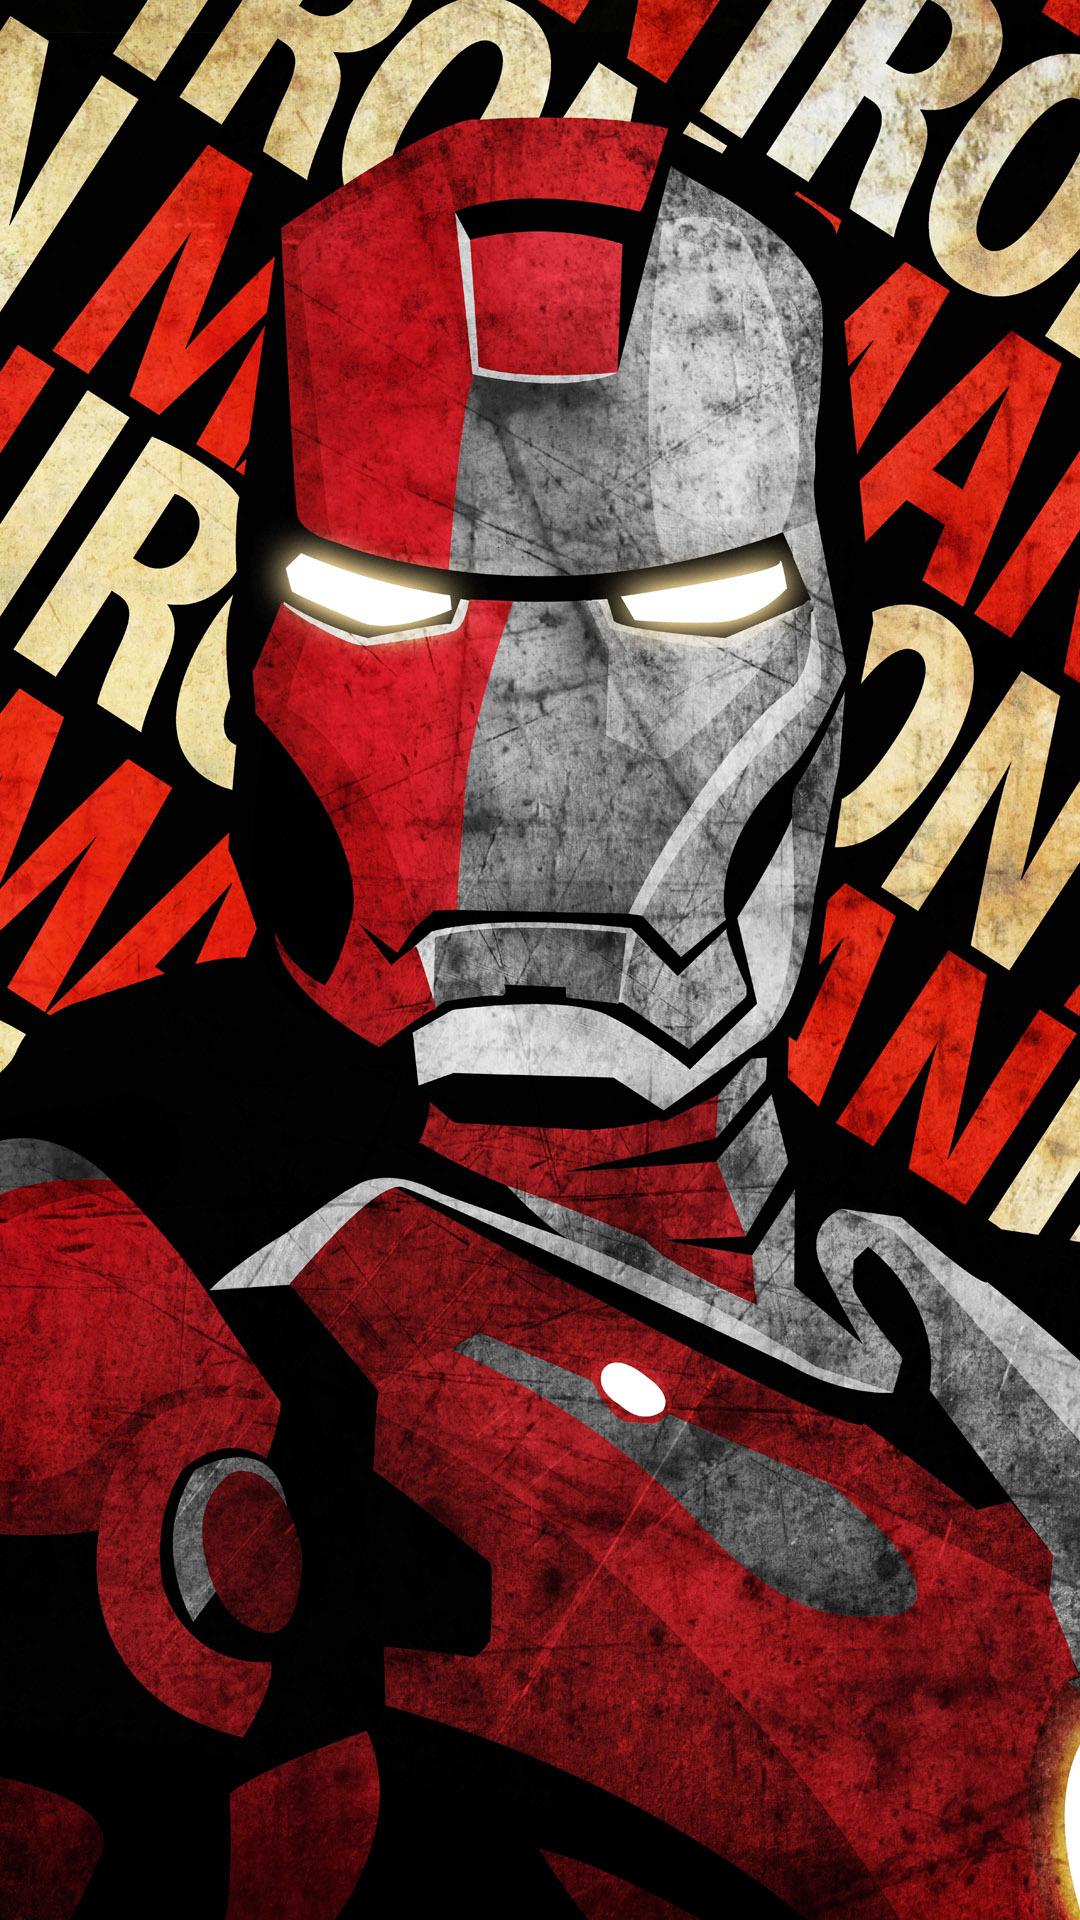 Iron man comic